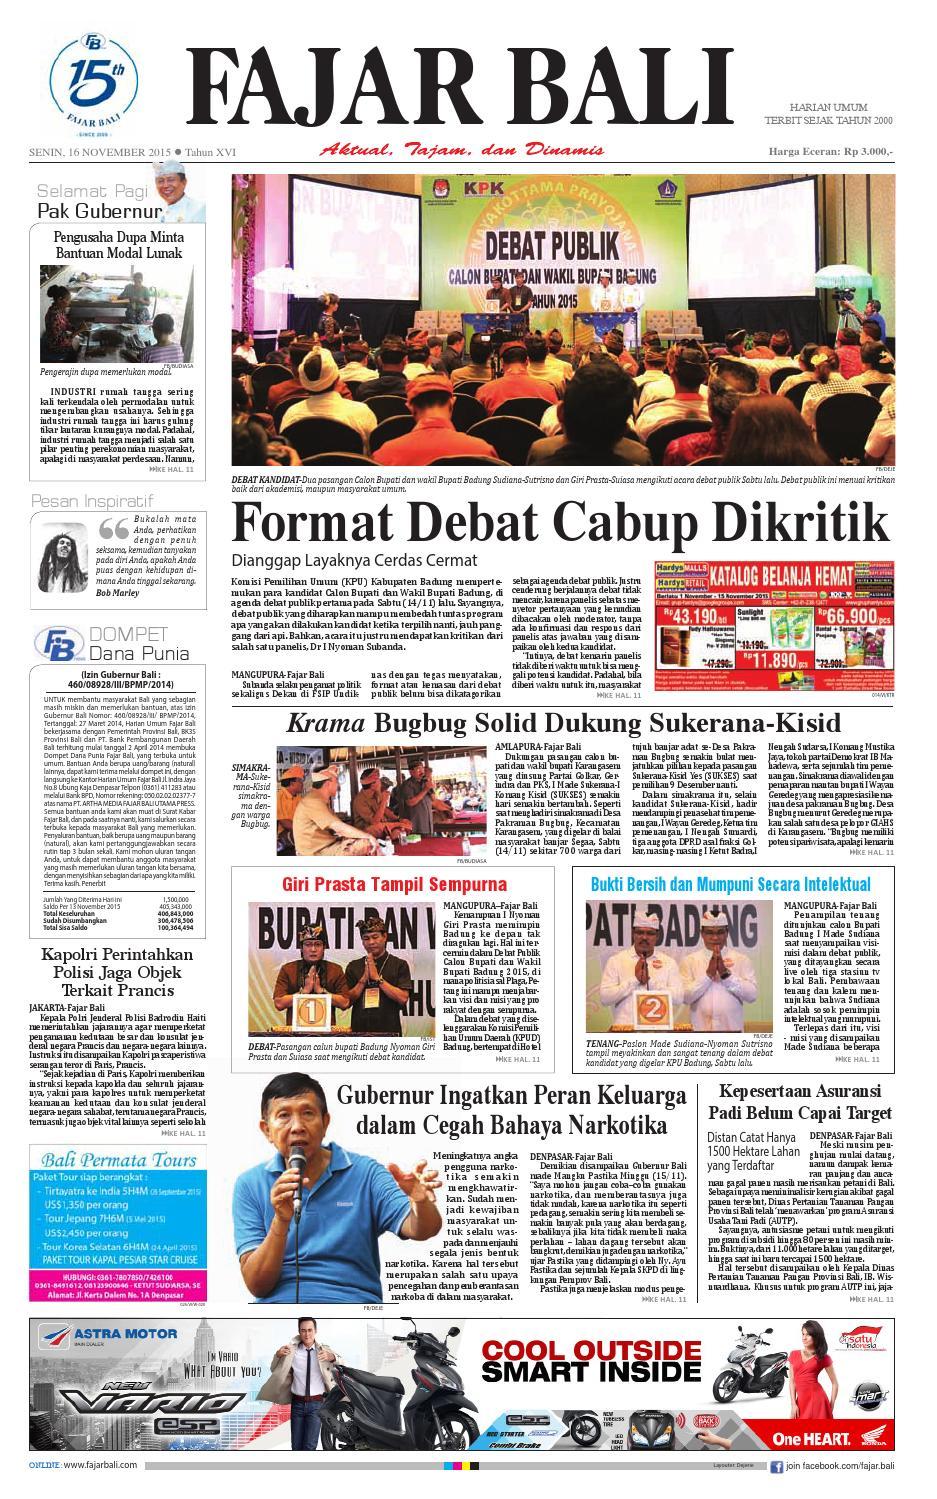 FAJAR BALI EDISI 16 NOVEMBER 2015 by hu fajarbali - issuu